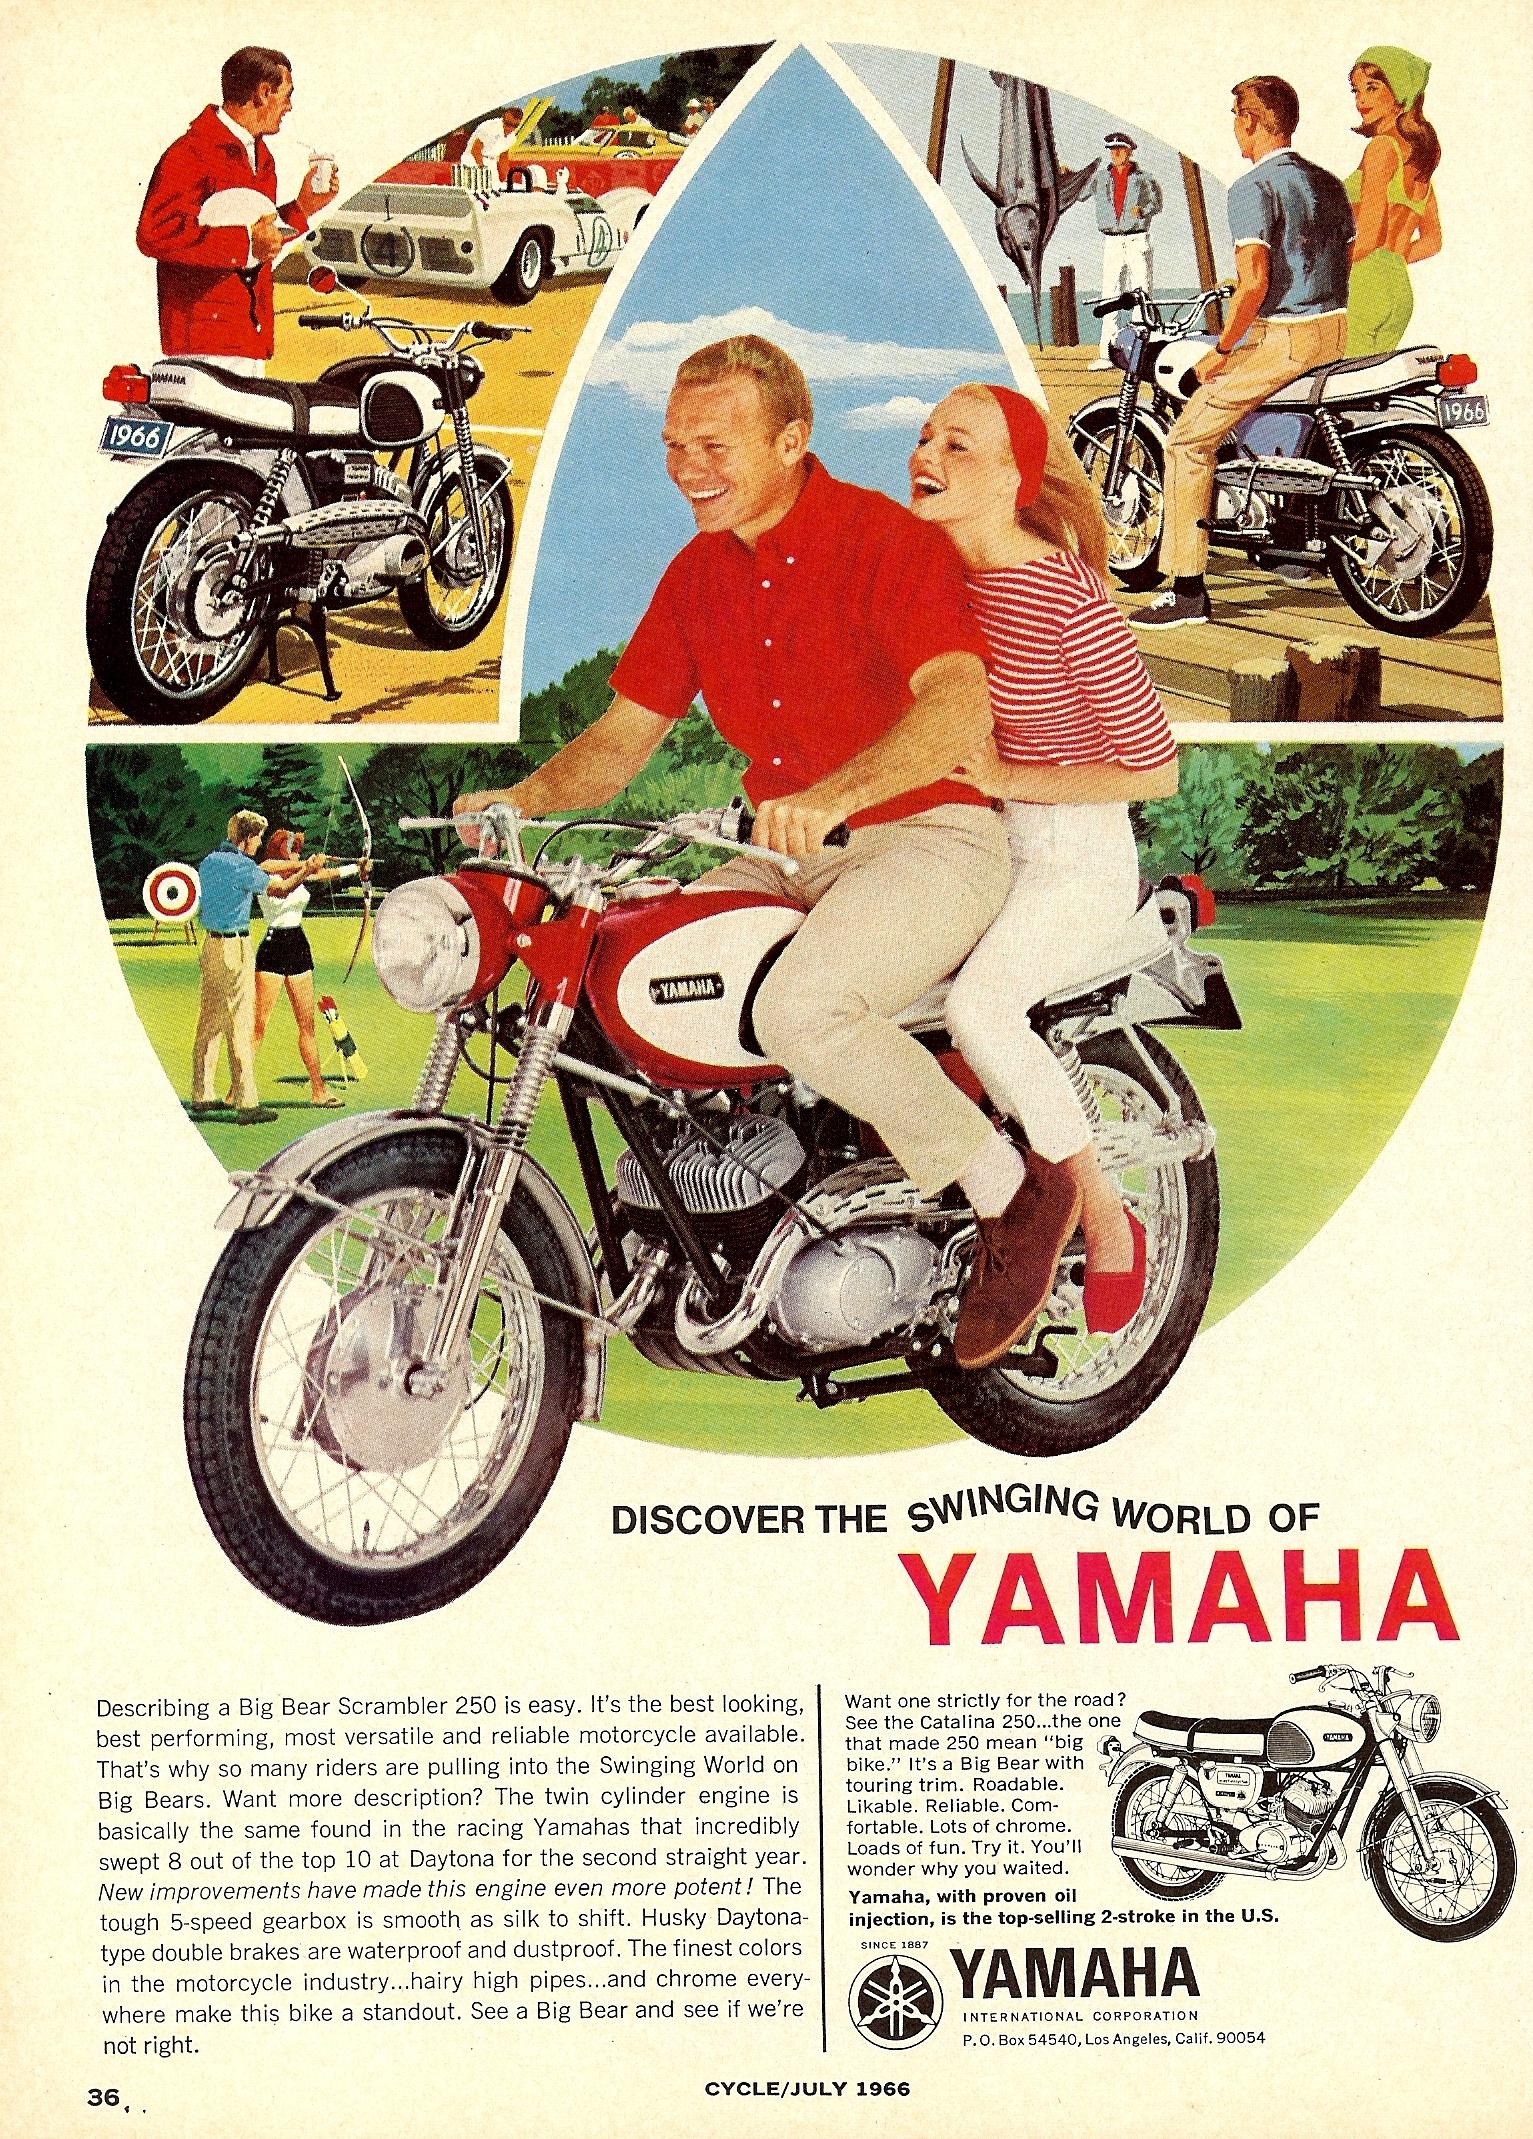 Yamaha Big Bear Scrambler 250 - published in Cycle - July 1966